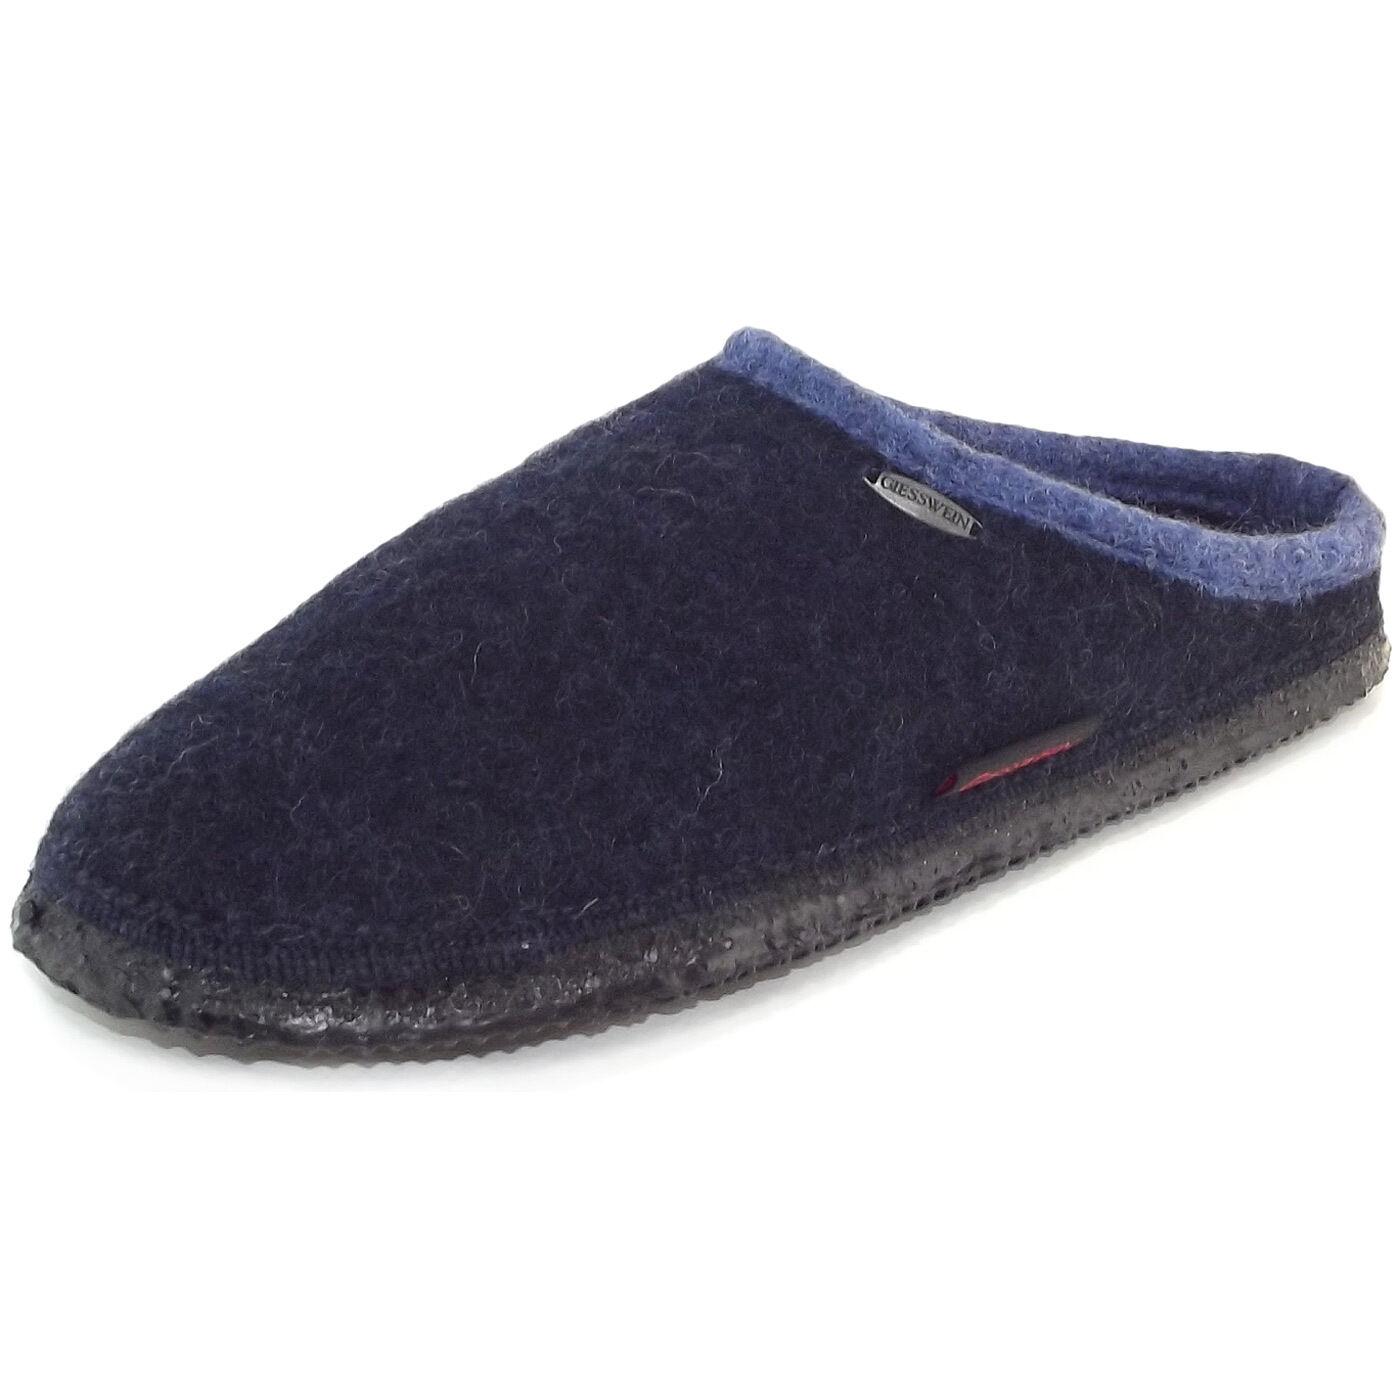 Billig hohe Pantoffeln Qualität Giesswein Dannheim Unisex Pantoffeln hohe nachtblau 58ee6b